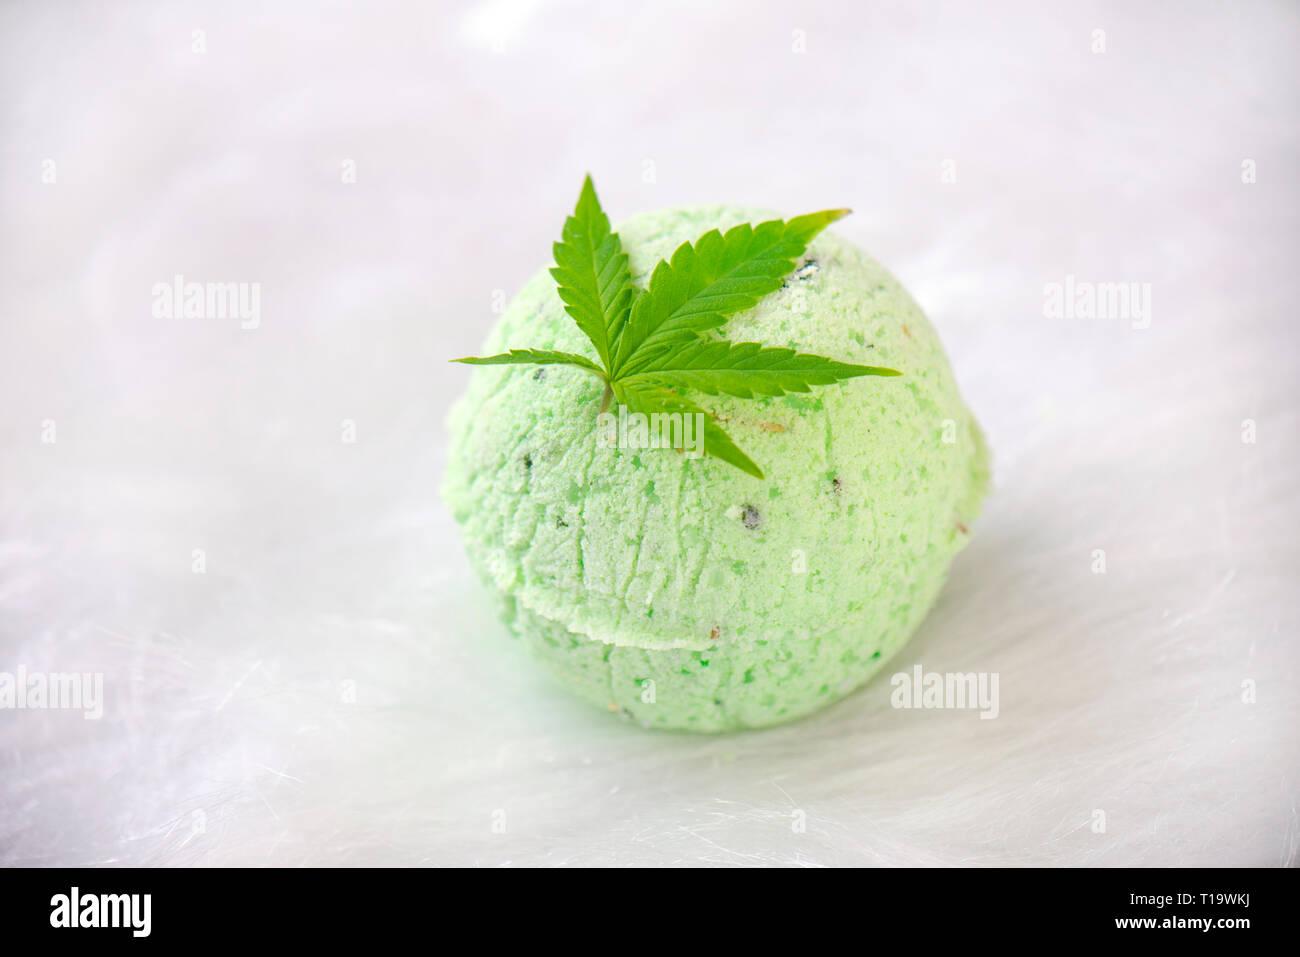 Round green cannabis bath bomb with marijuana leaf isolated on white background - Stock Image